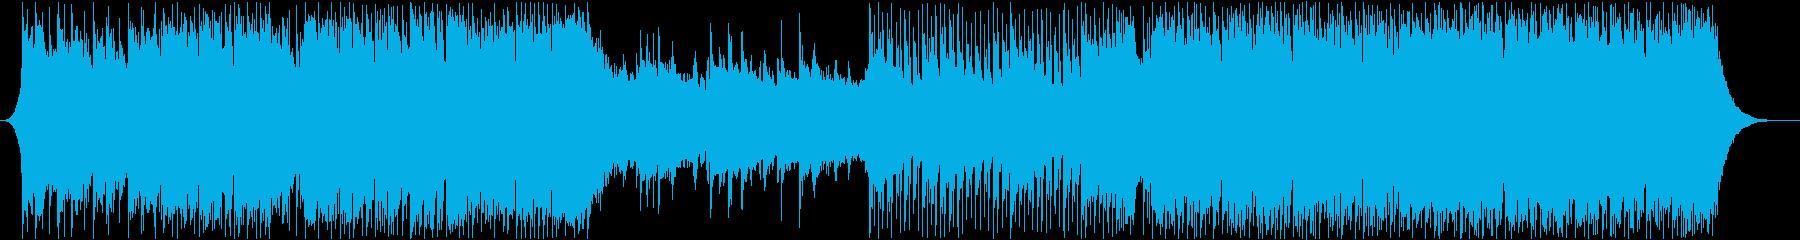 OP・ED・星空・キラキラ・スマホの再生済みの波形